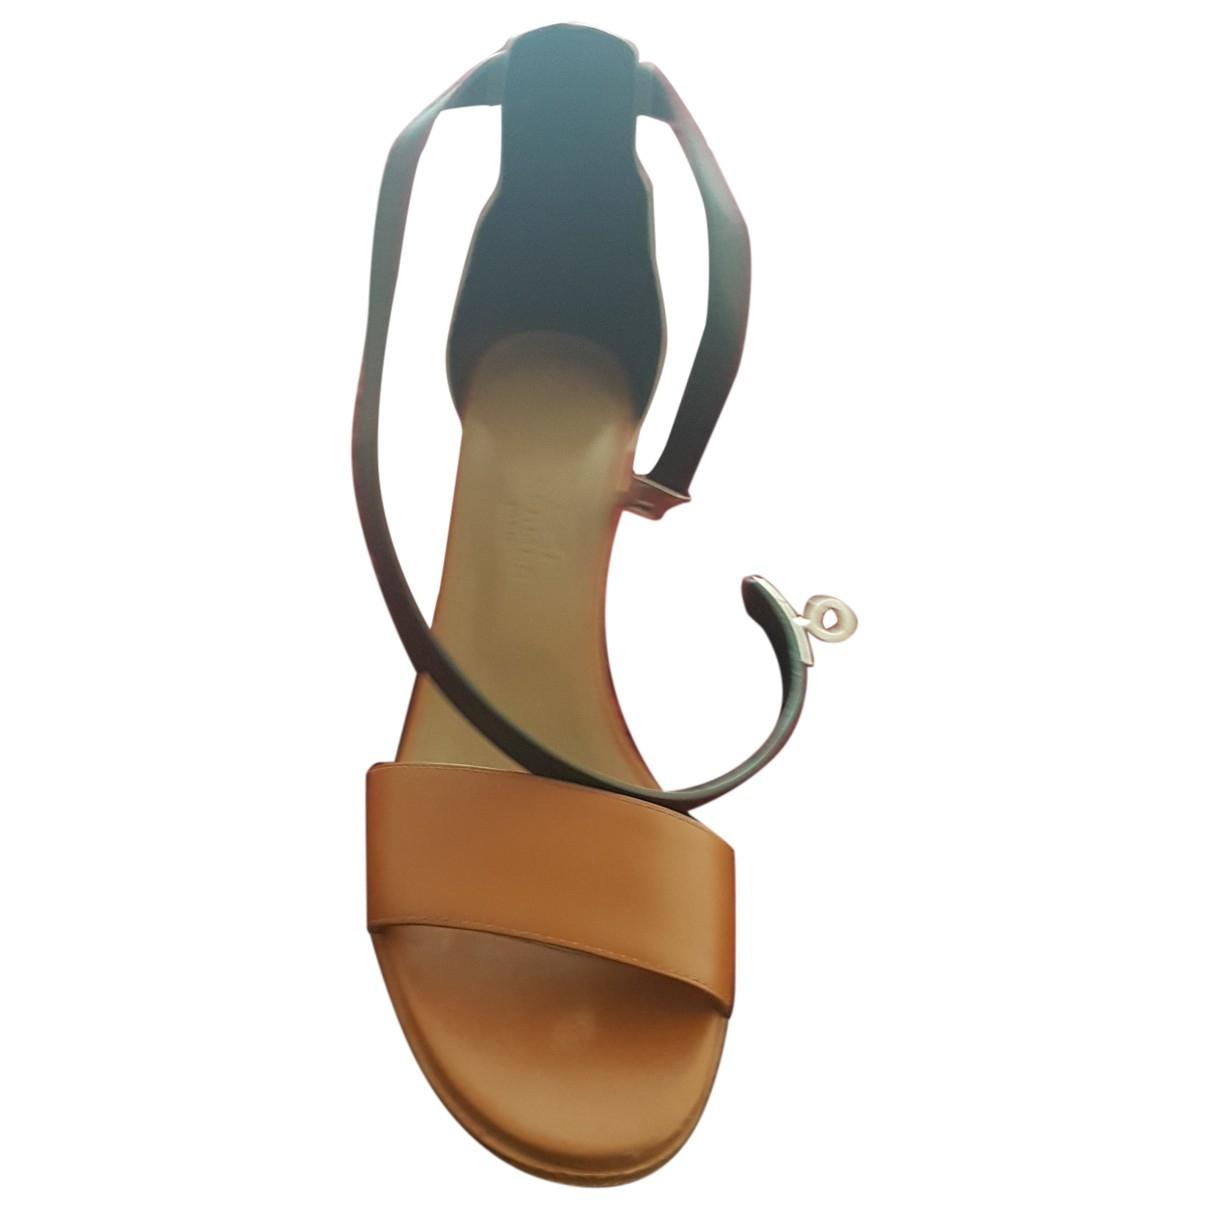 Hermès \N Camel Leather Sandals for Women 35 EU